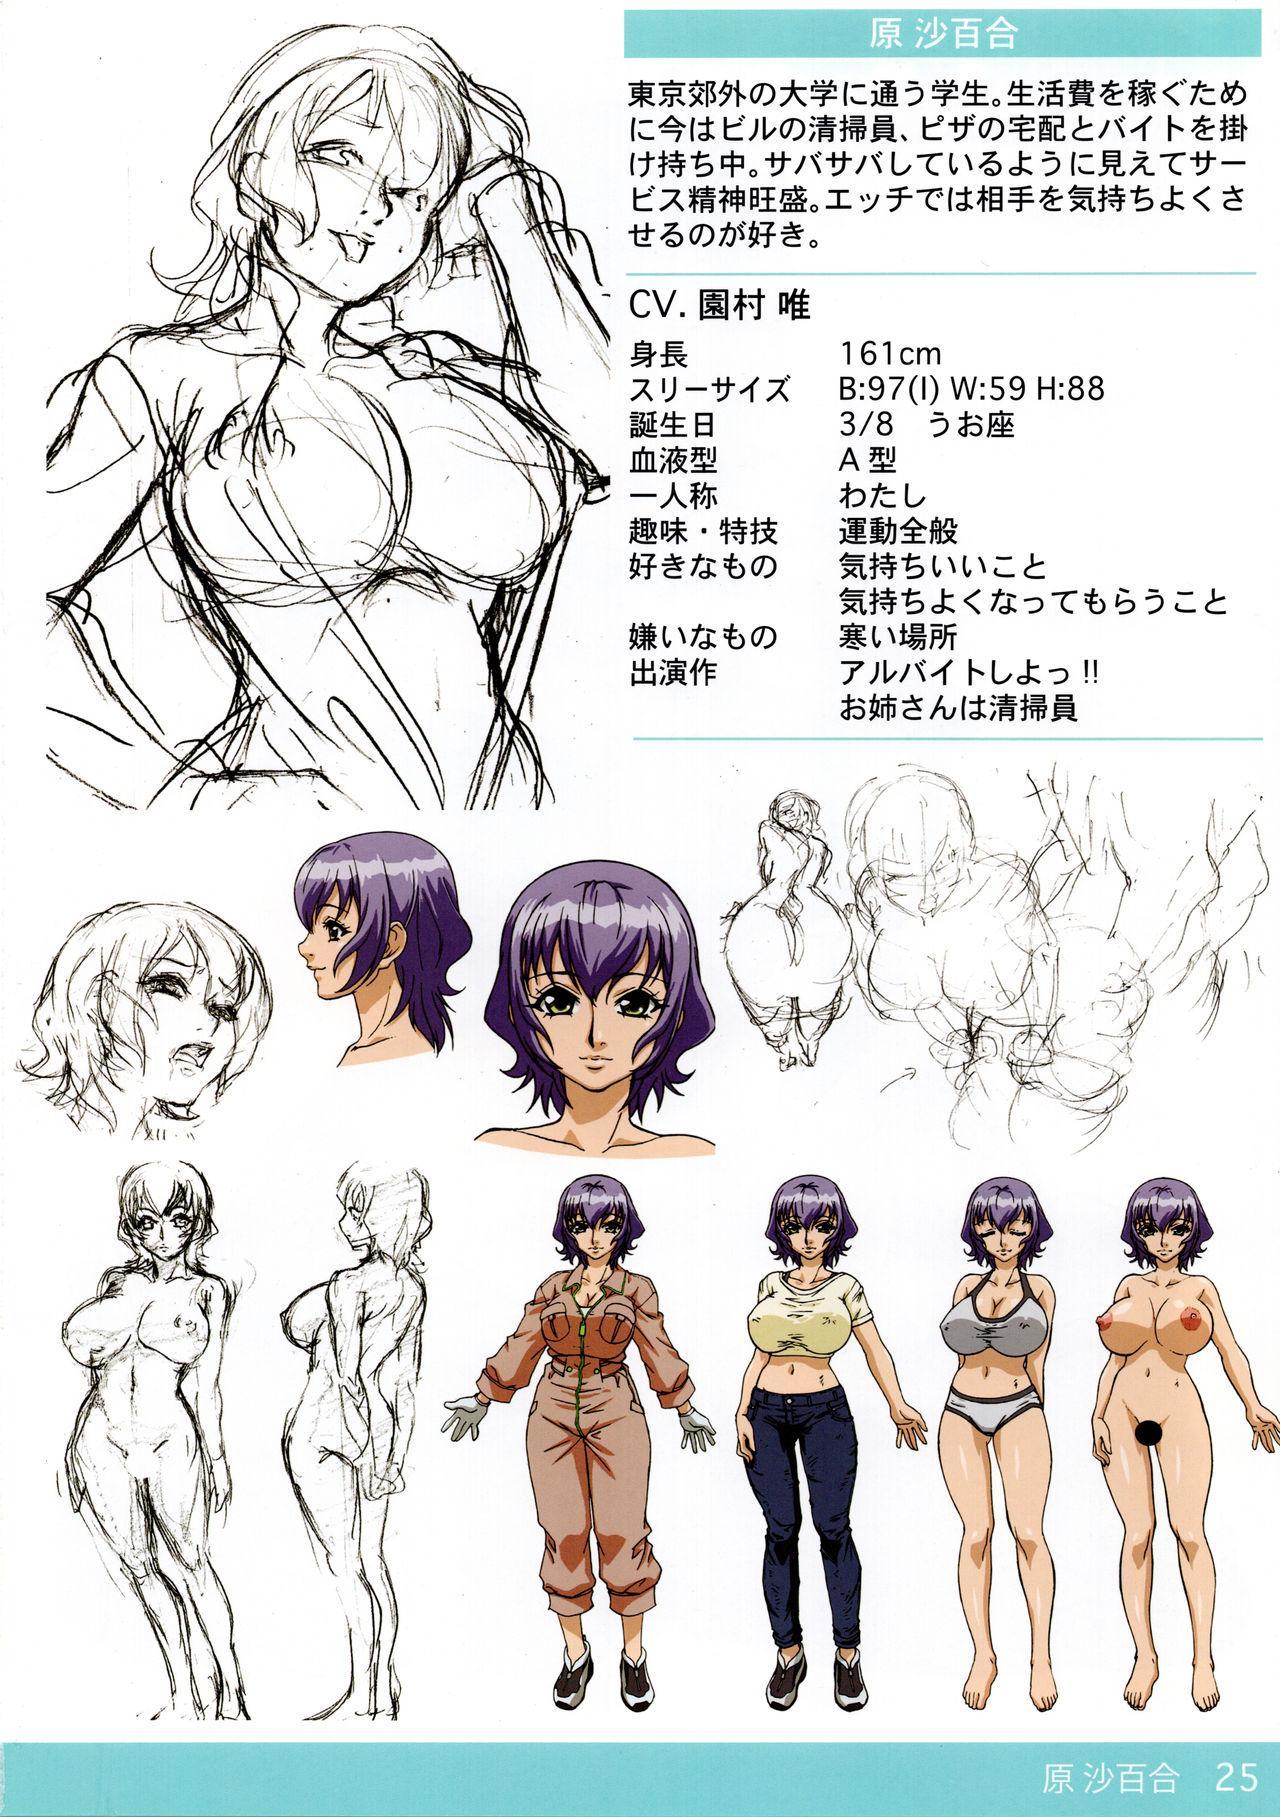 Chichinoya Gashuu 23